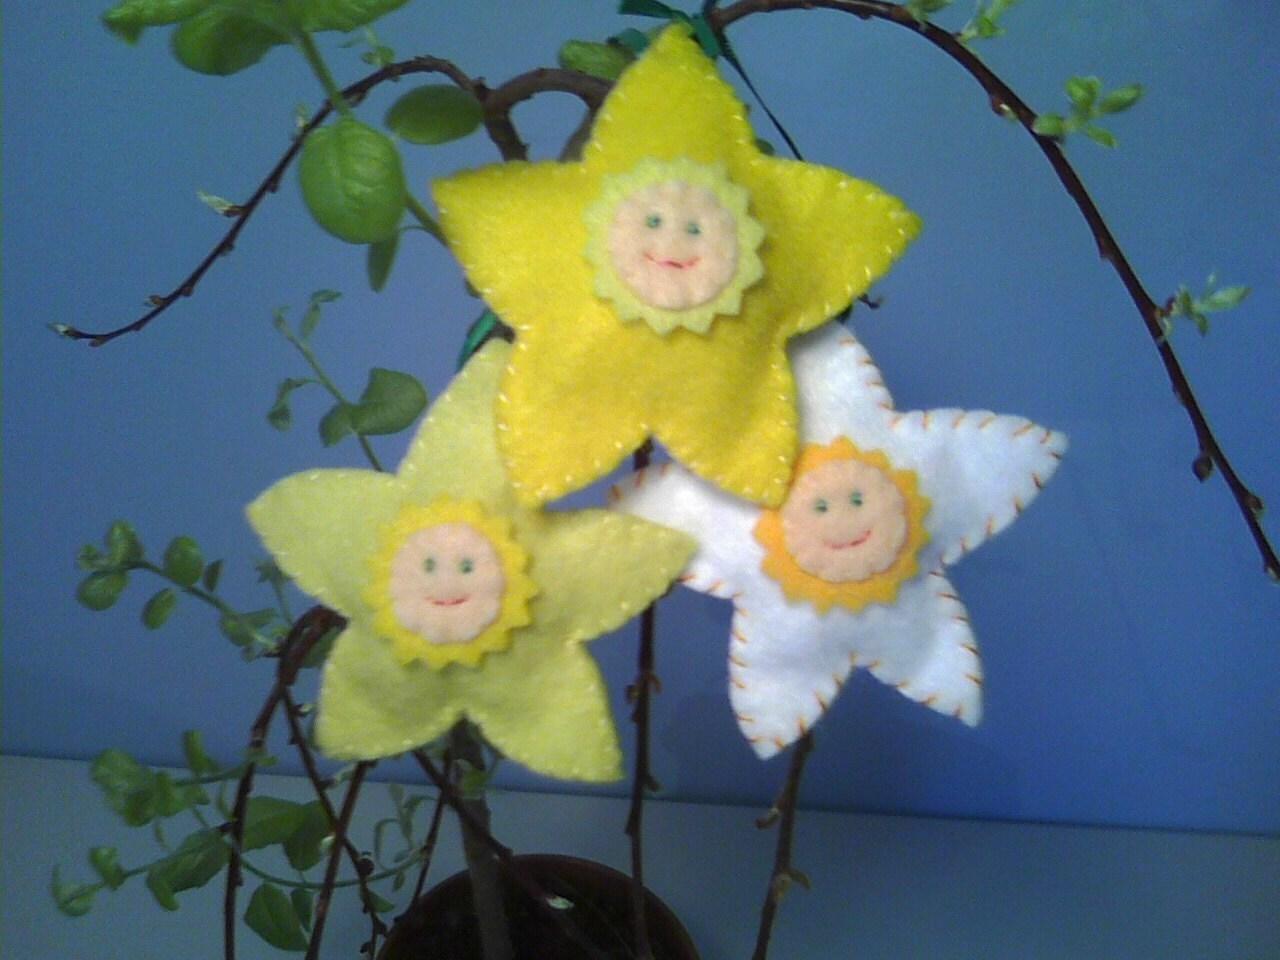 Daffodil Jonquil and Narcissus Felt Flower Ornaments